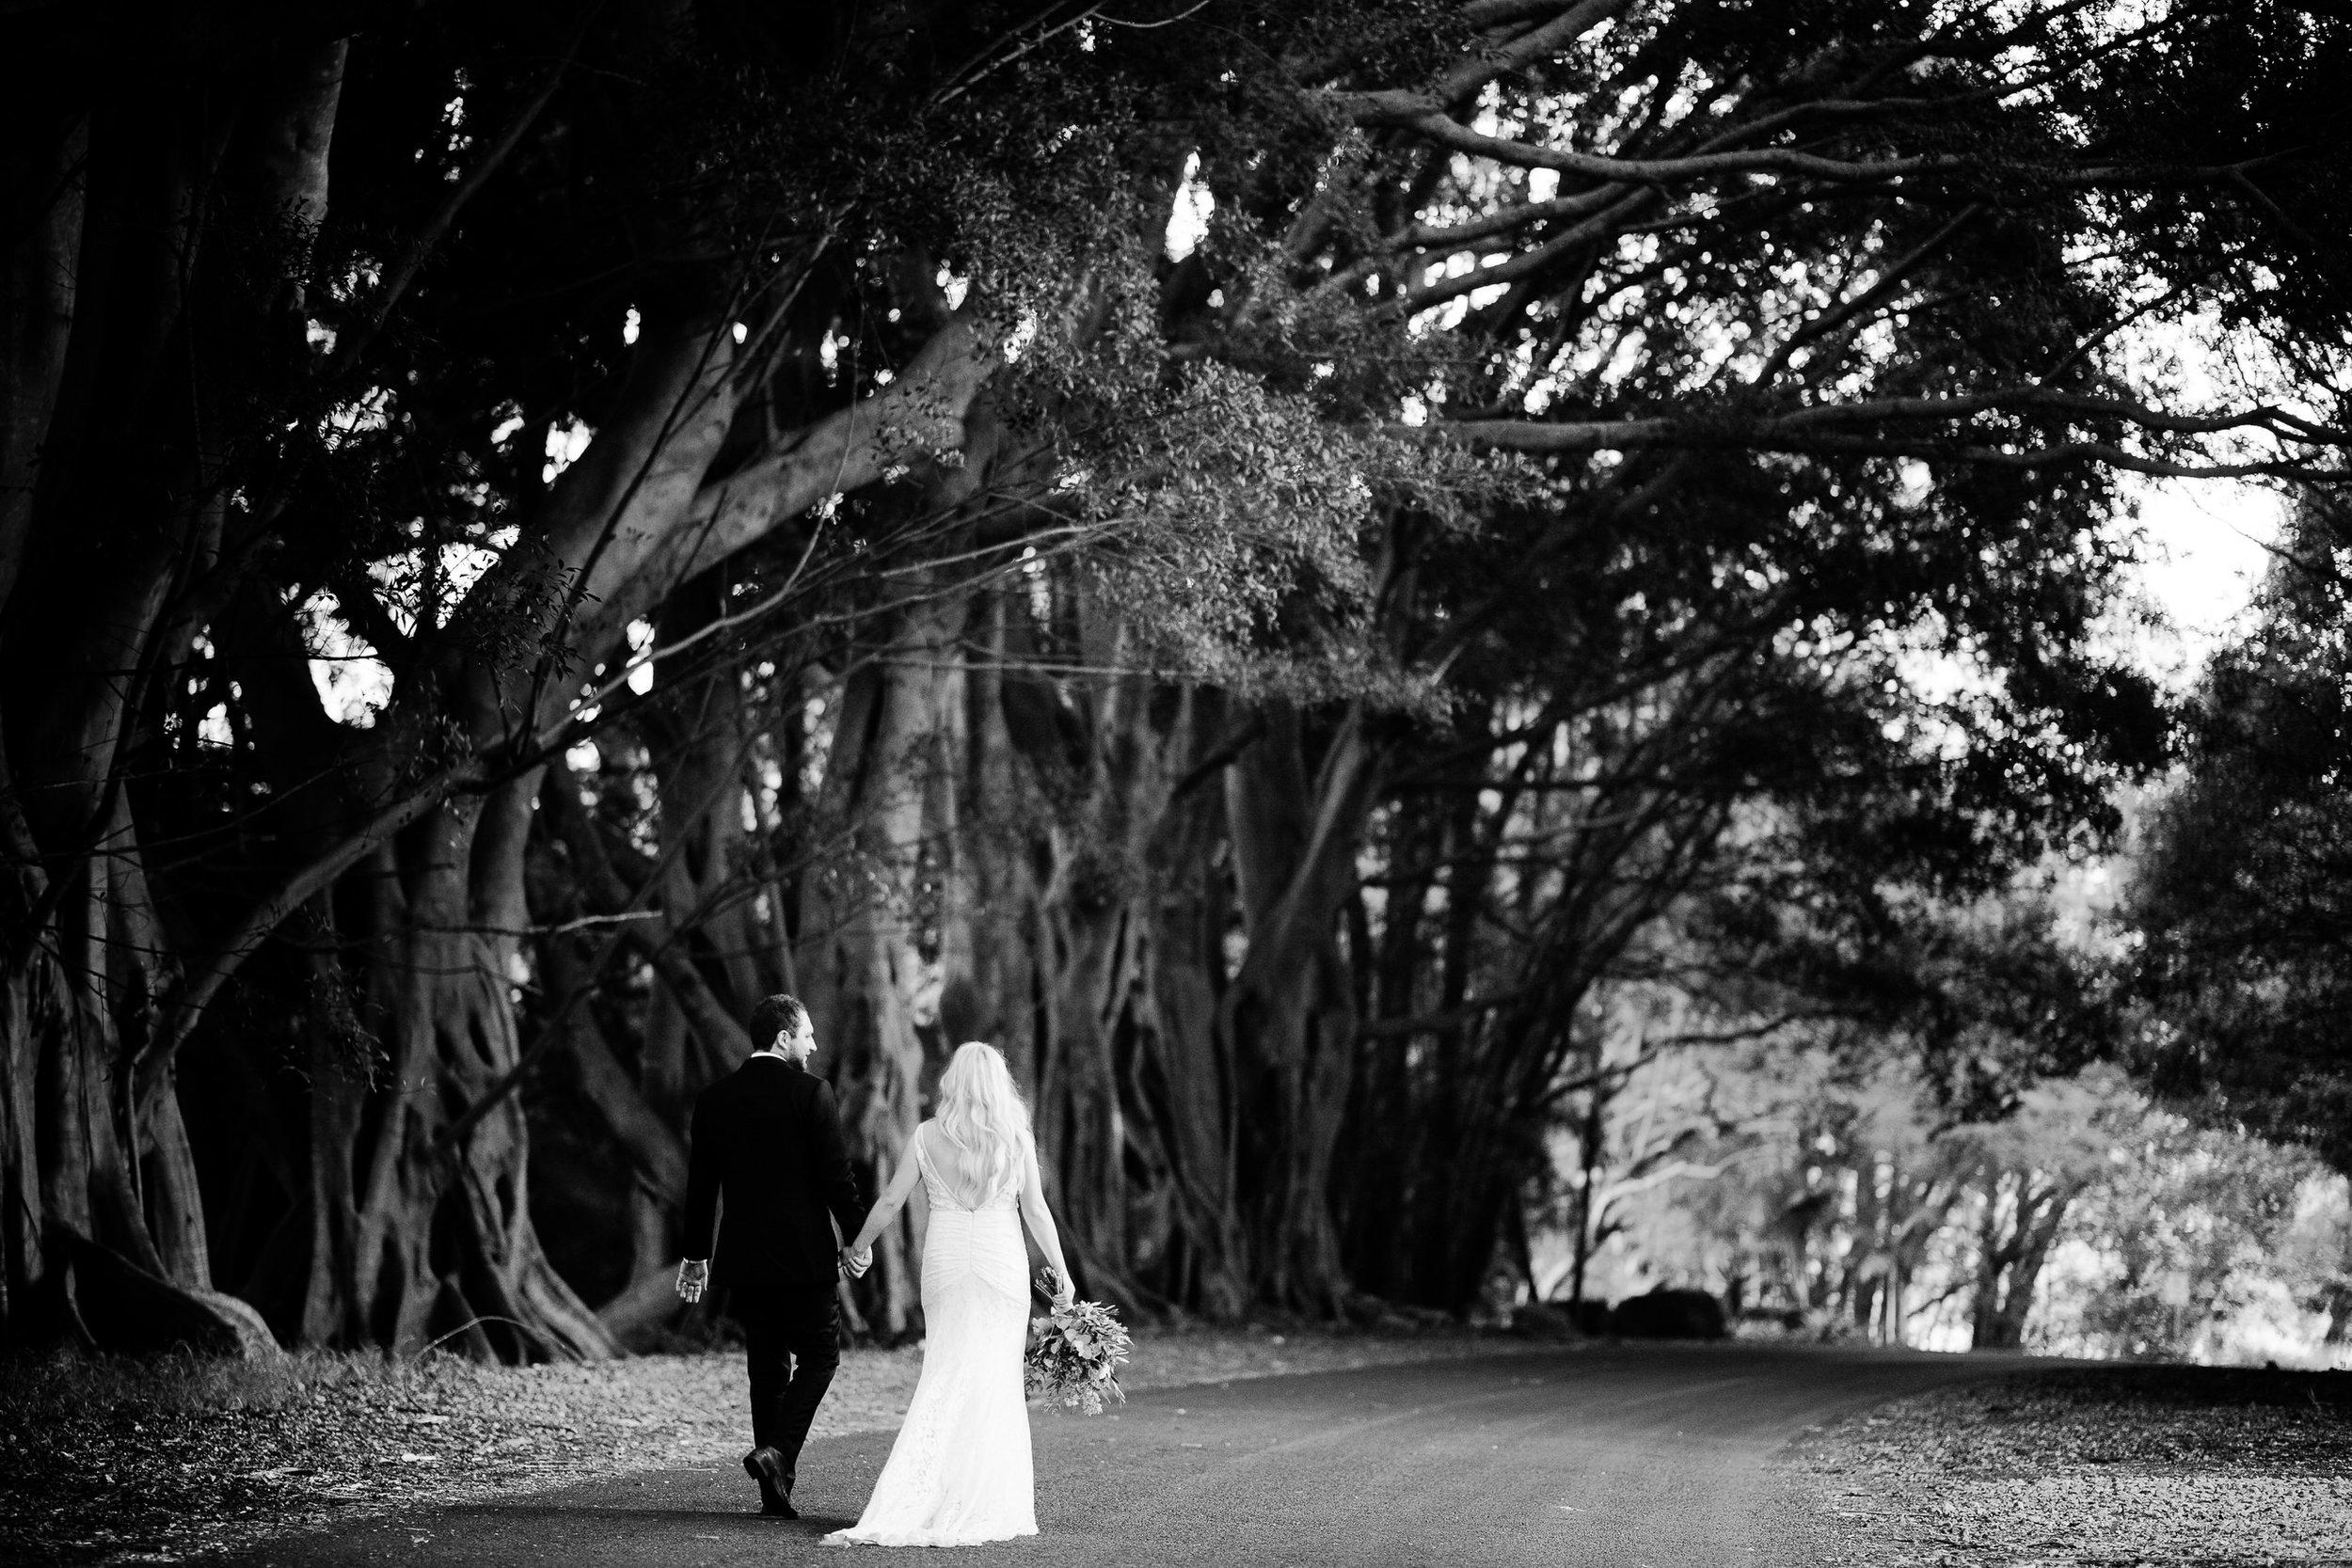 Justin_And_Jim_Photography_Byron_Bay_Wedding079.JPG